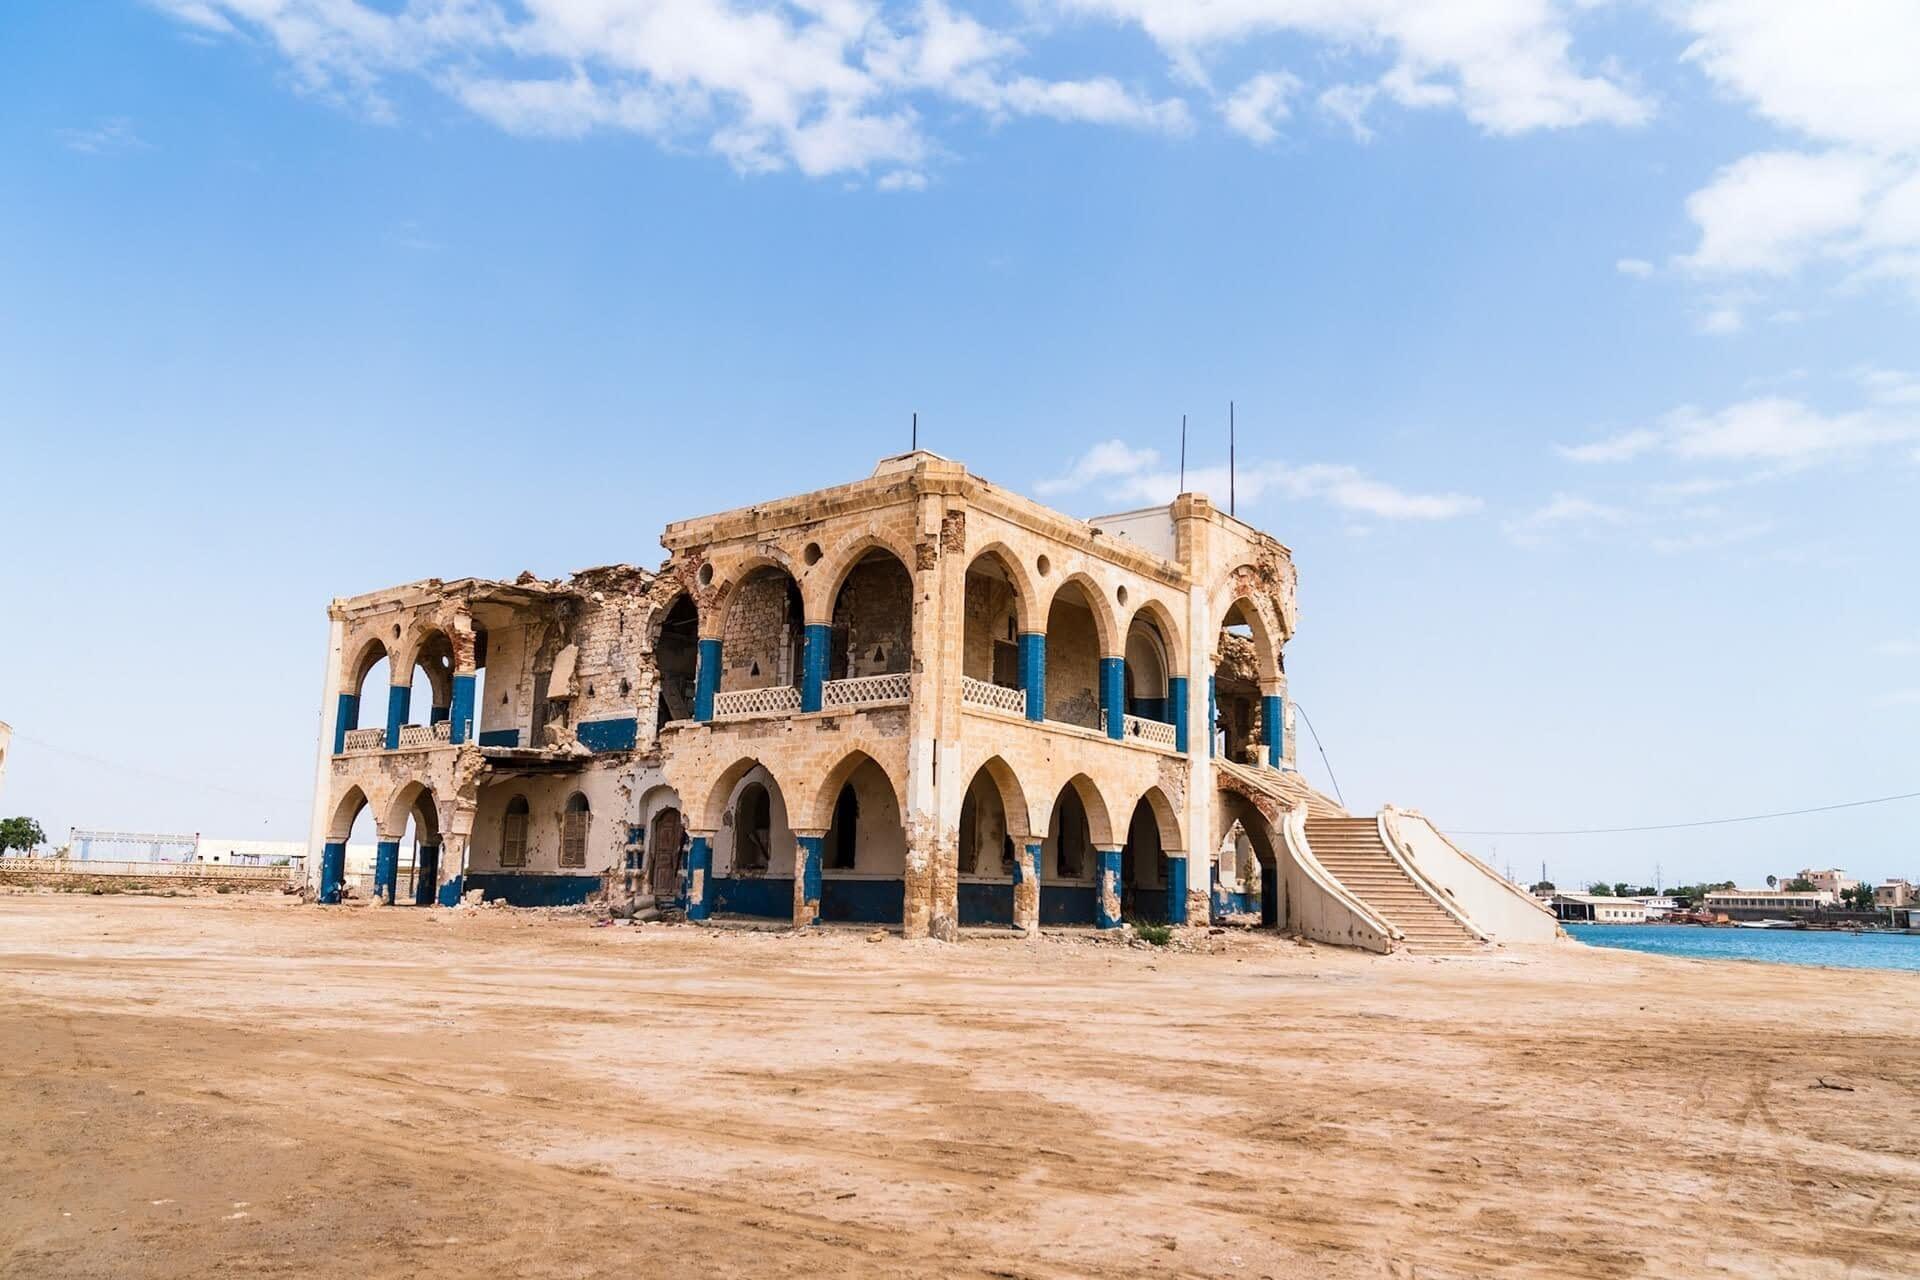 Massawa the port city of Eritrea - Tour Asmara